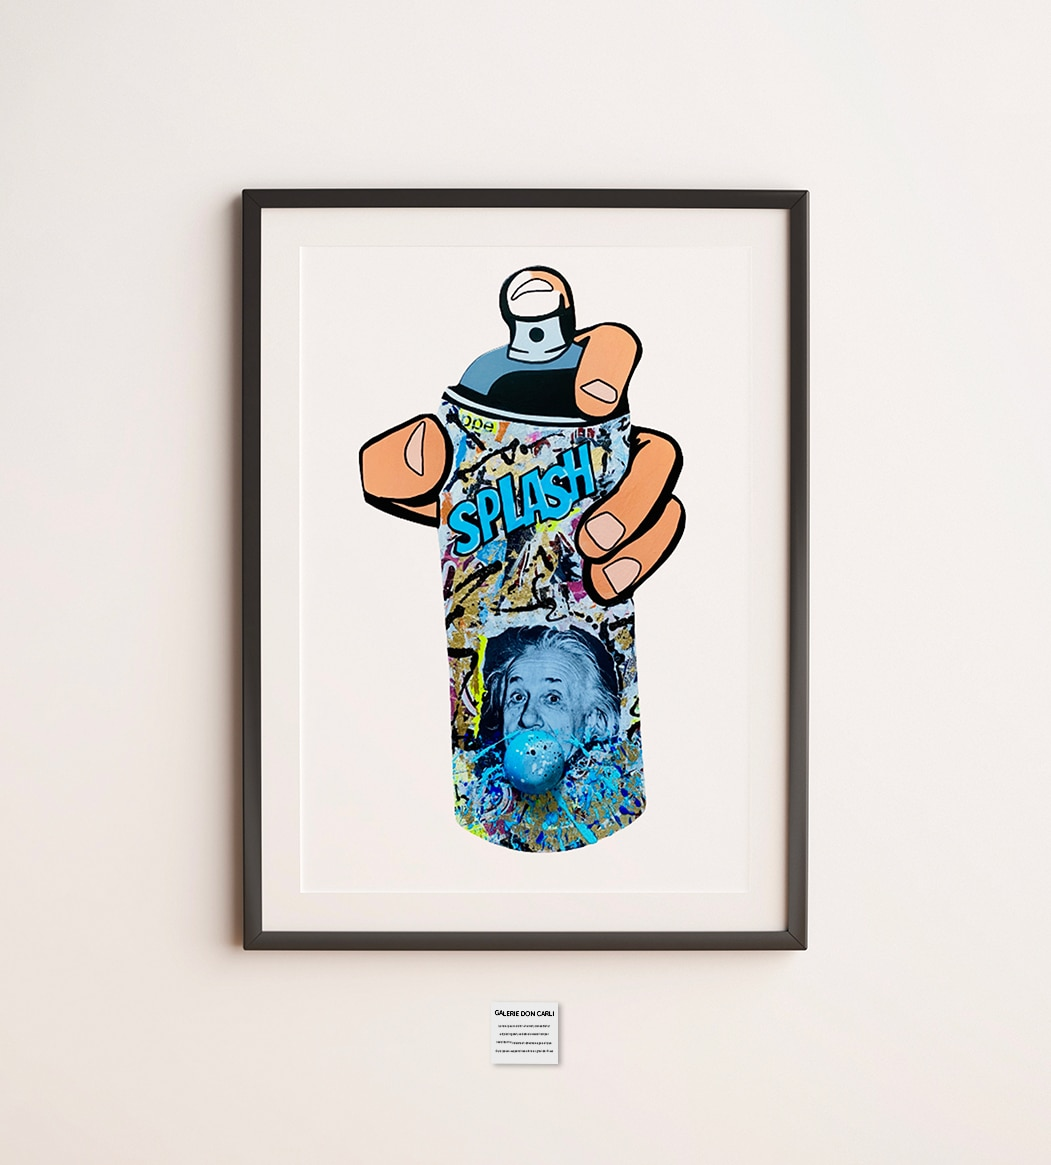 splash-bubble-houdemont-julie-galerie-don-carli